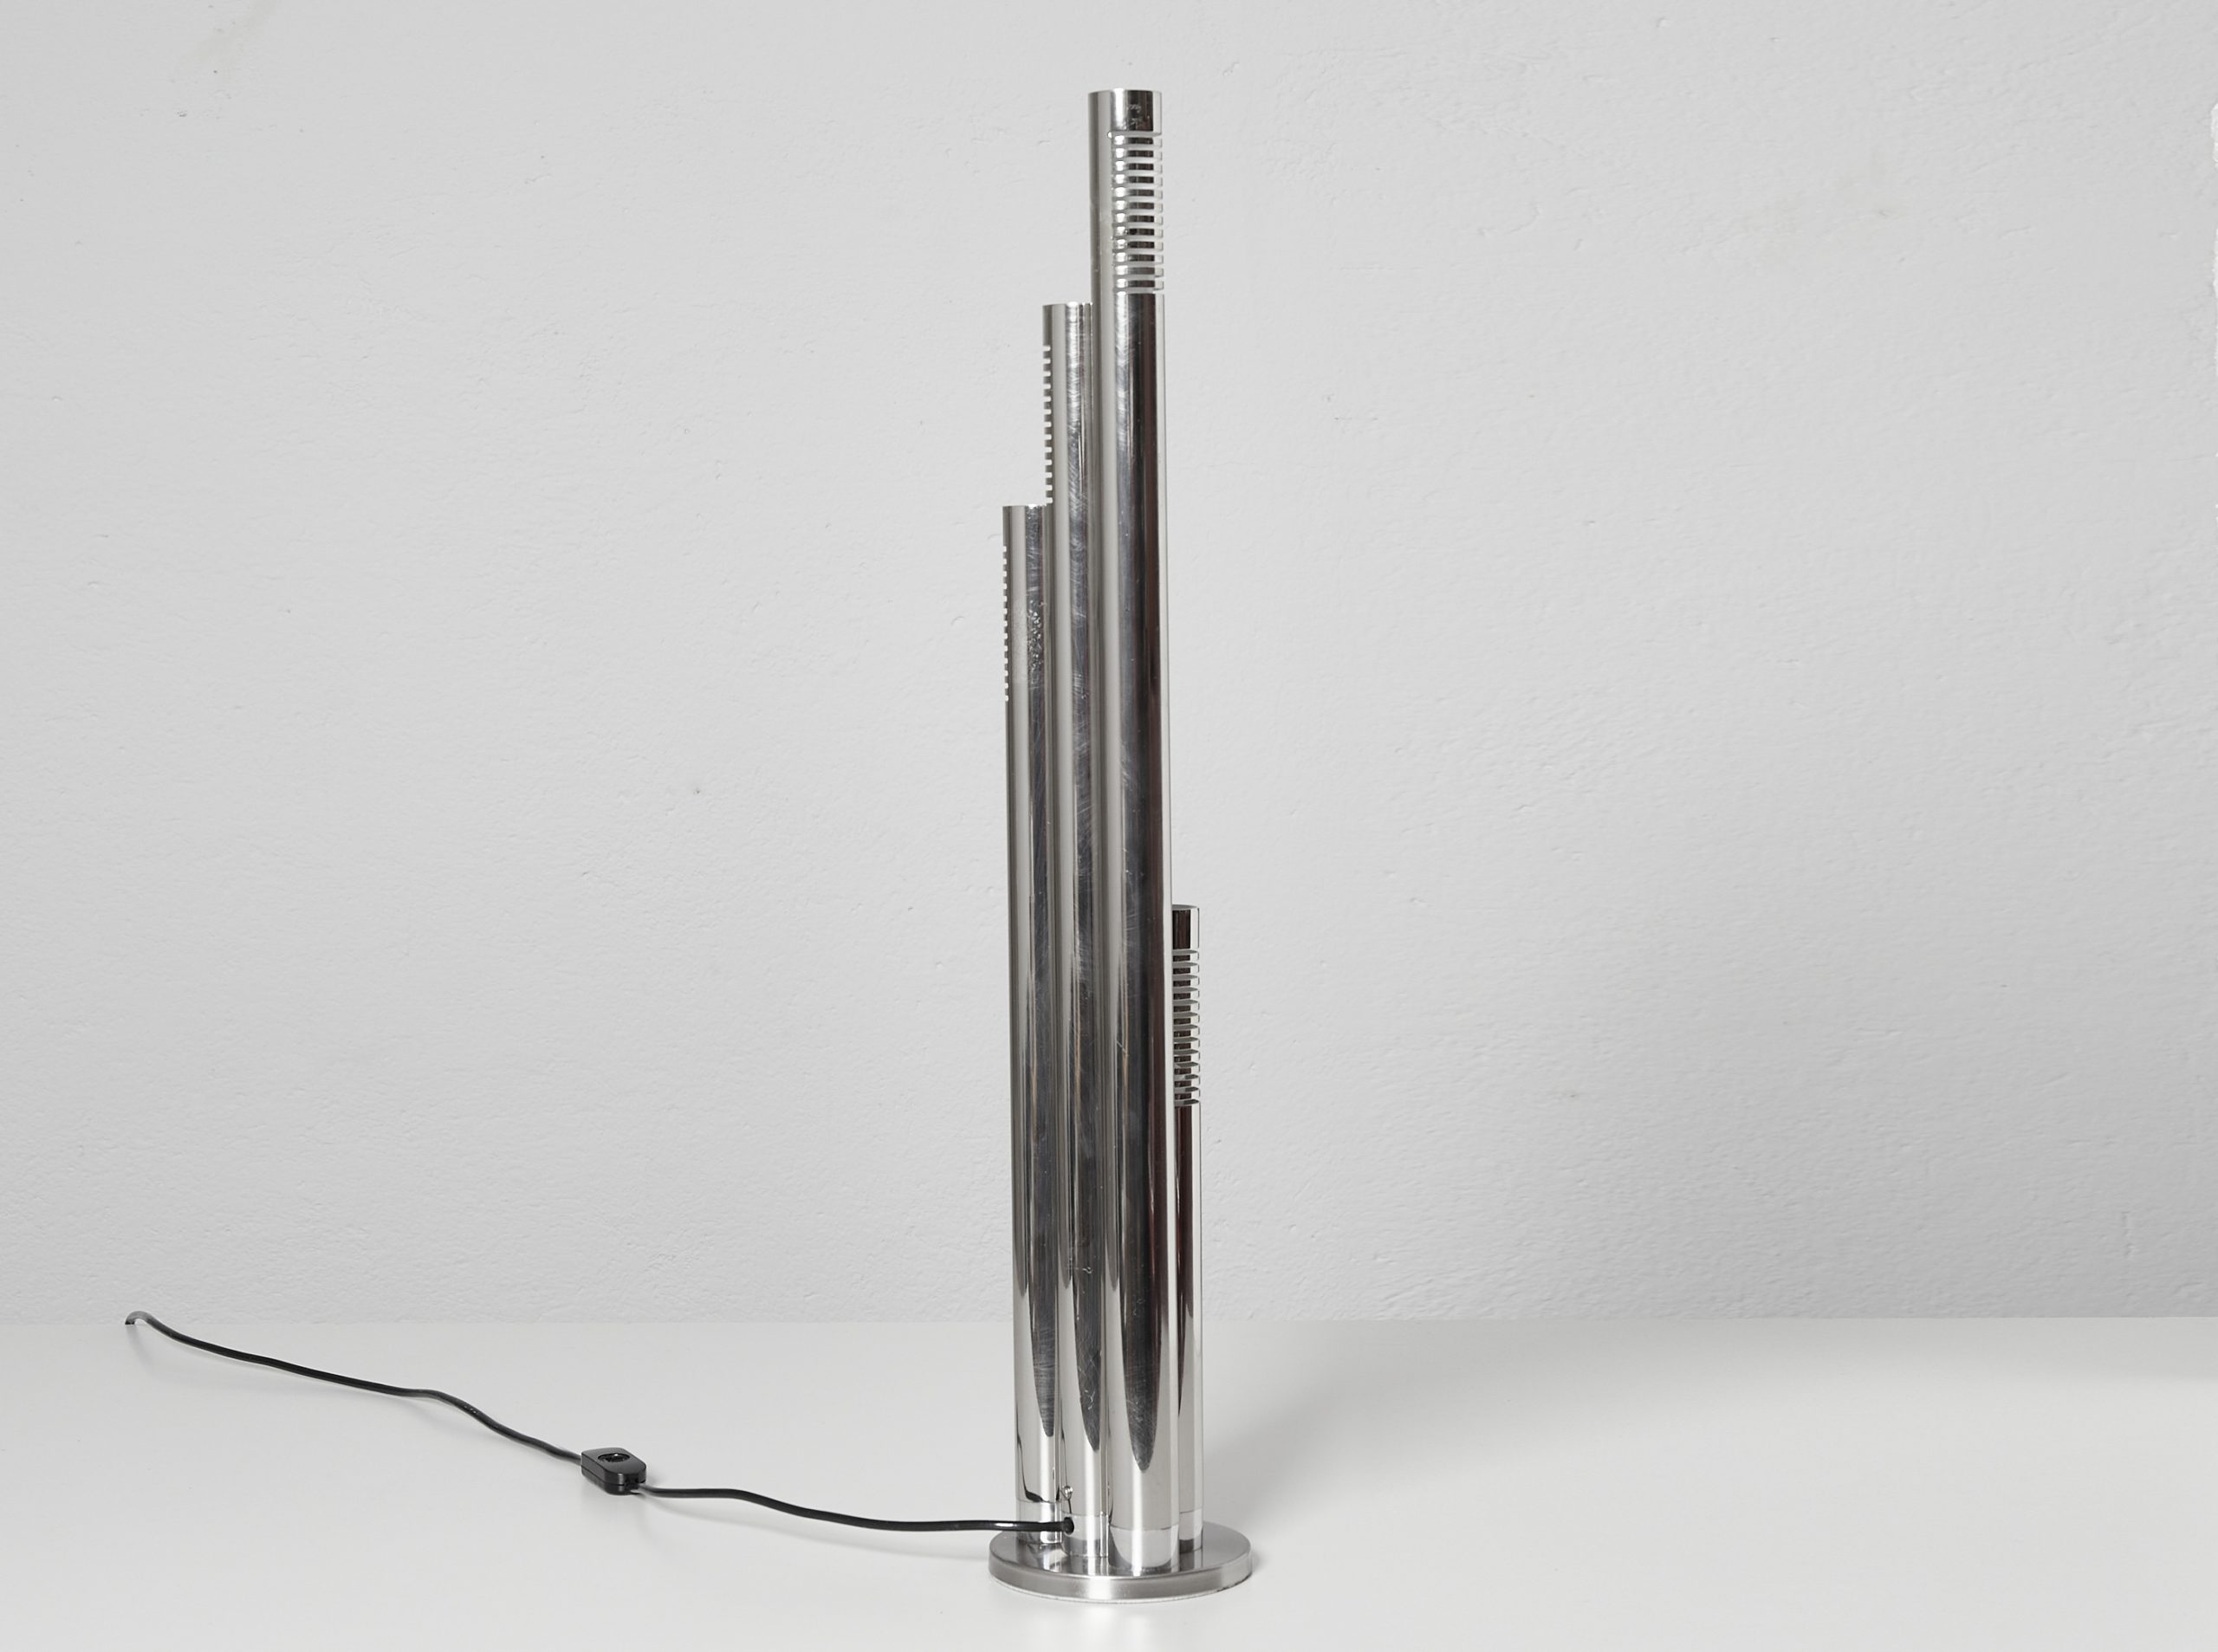 italian-chromed-metal-tubular-table-lamp-c-1970-image-09